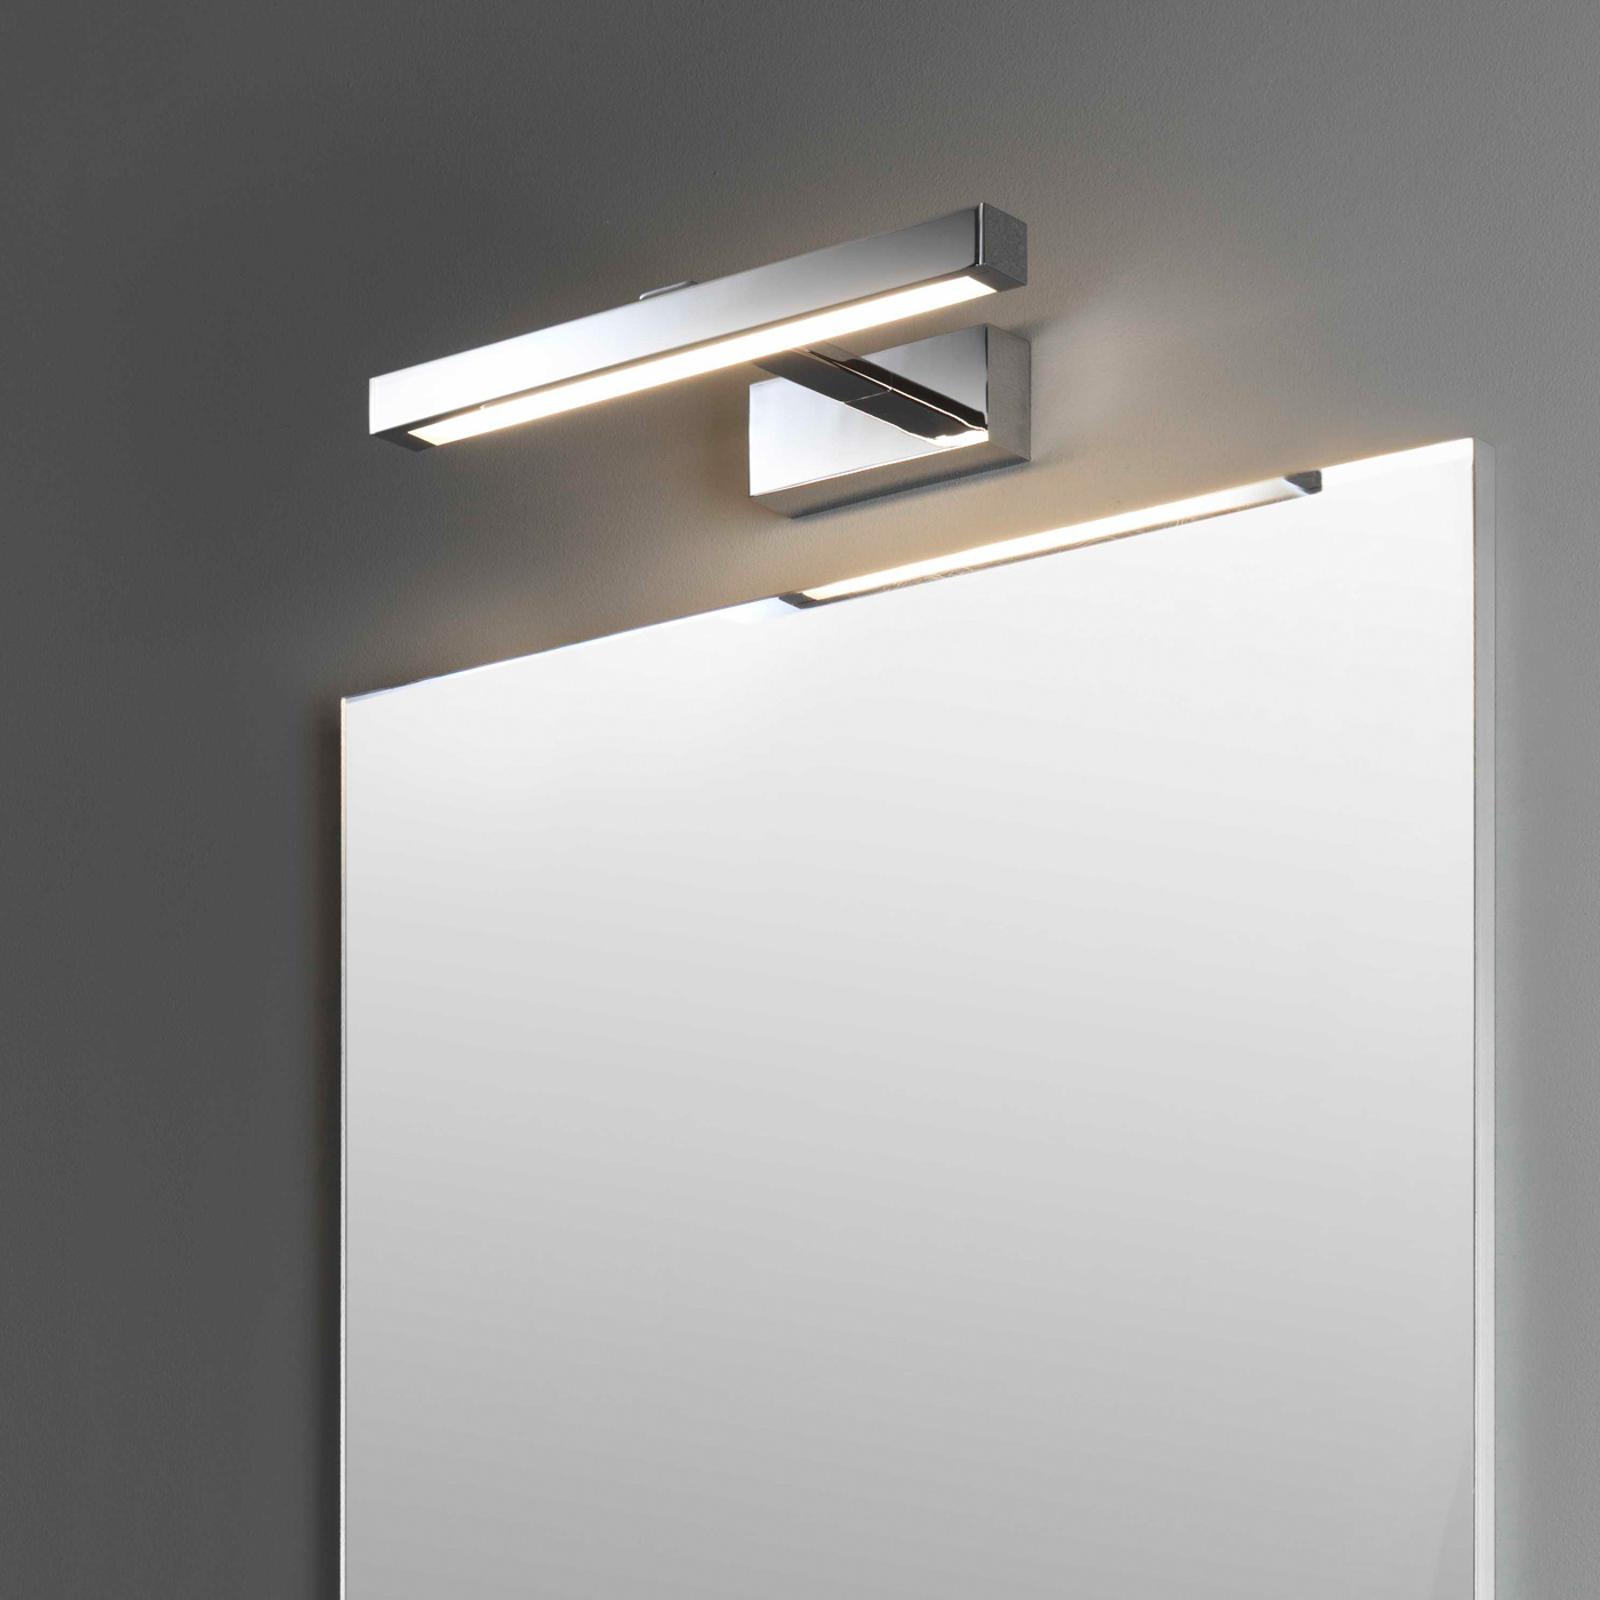 Astro Kashima 350 LED-spejllampe, krom, 35 cm